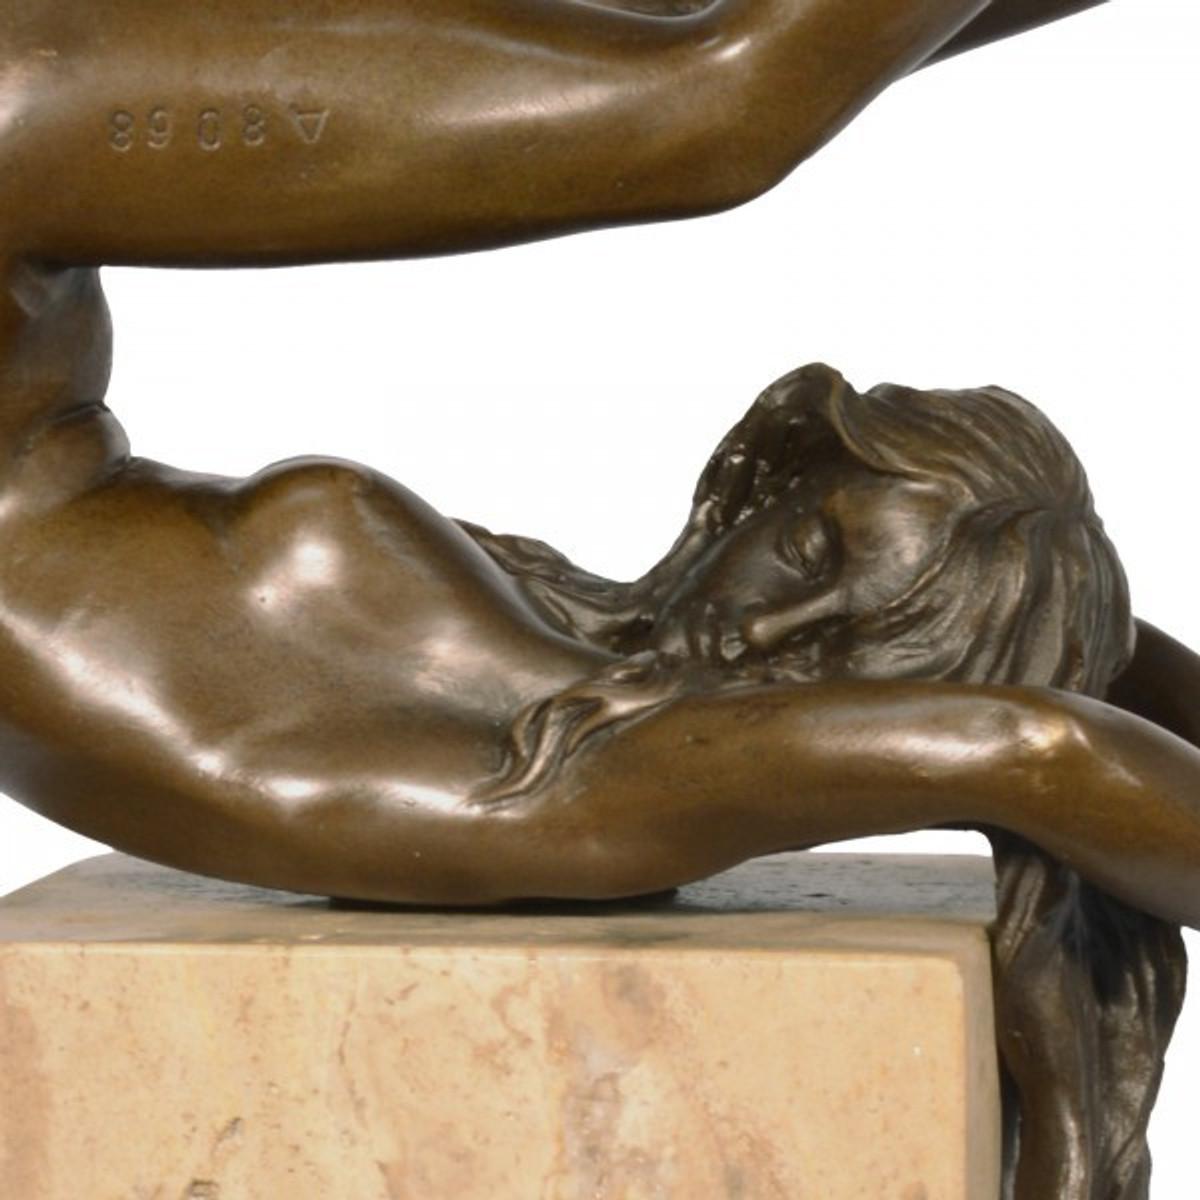 Erotik Frauenakt Skulptur heller Marmor als dekorativer Akt im klassischen Antik Stil.